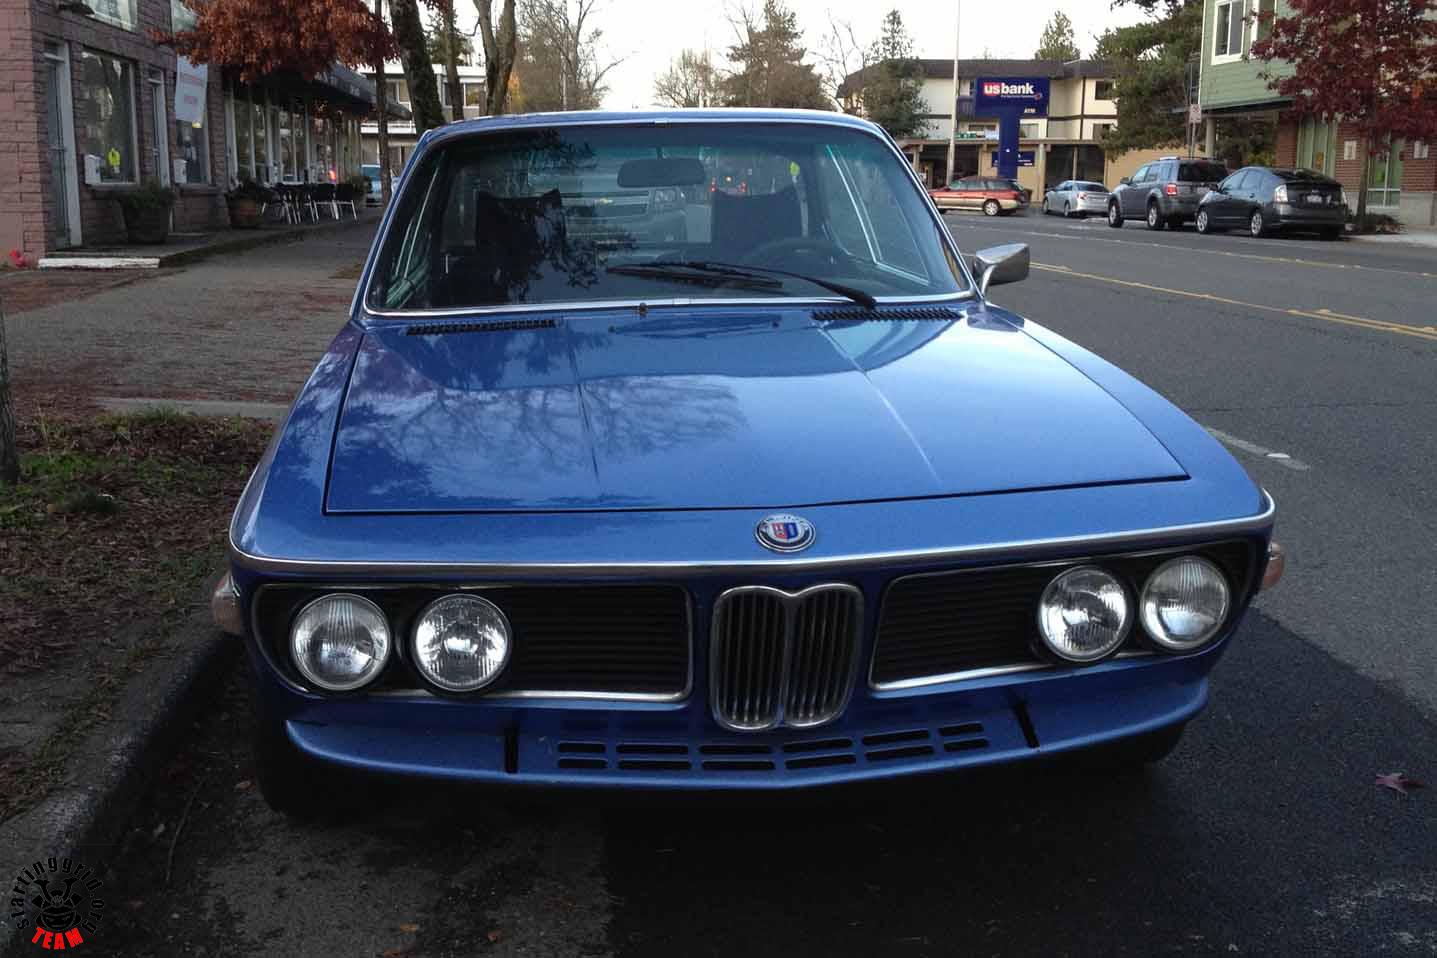 Street Parked: BMW 3.0 CSi | |StartingGrid|